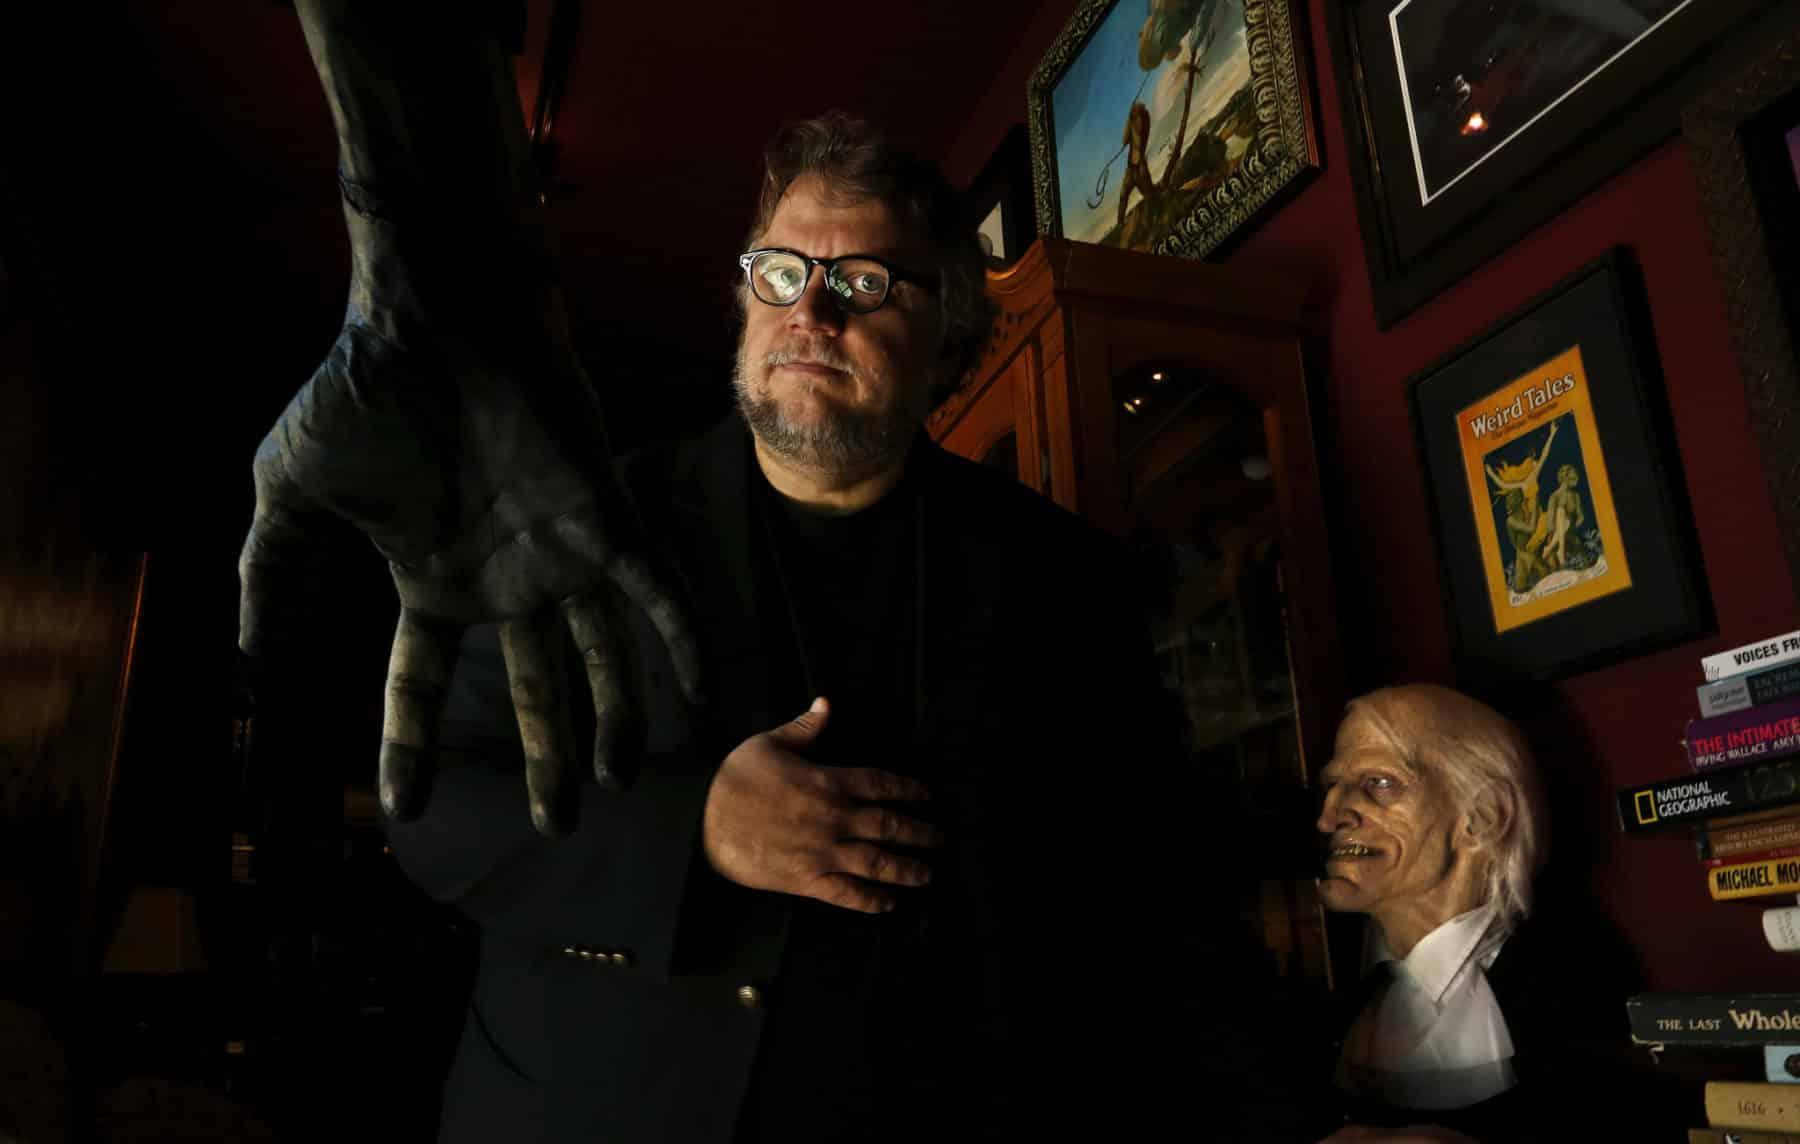 Scary Stories to Tell in the Dark arrancará su rodaje este verano